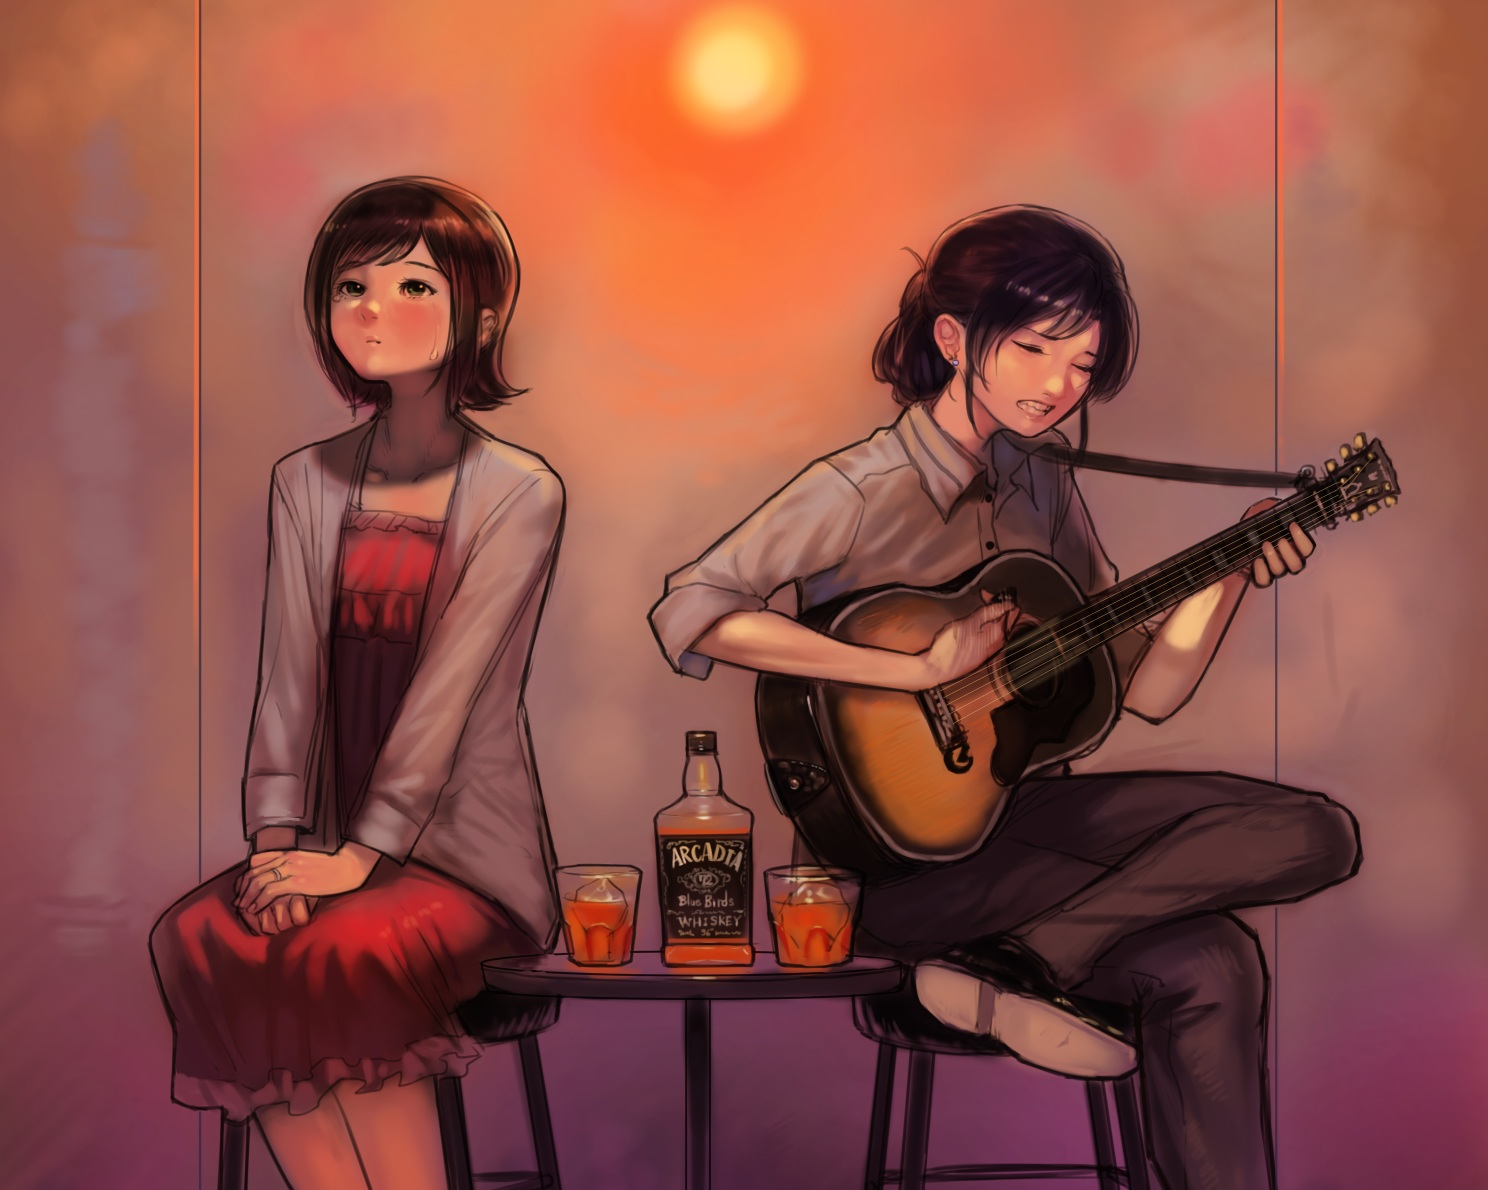 2girls amami_haruka bukimi_isan cropped dress drink guitar idolmaster instrument kisaragi_chihaya shirt